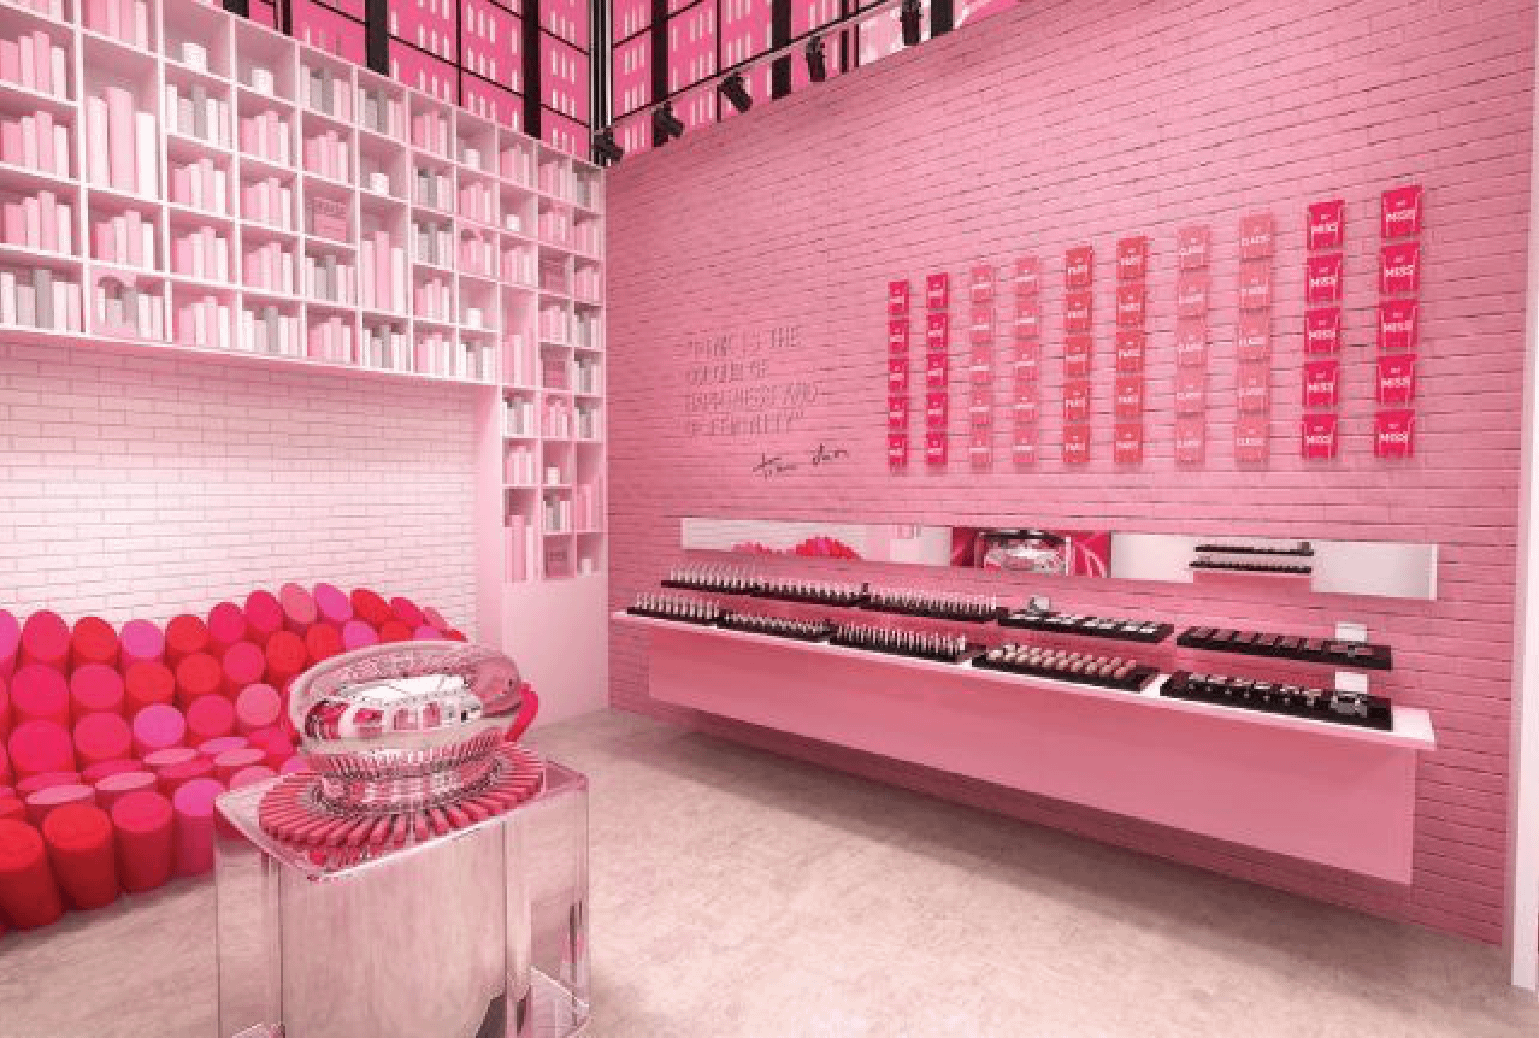 Magasin Dior Pink City